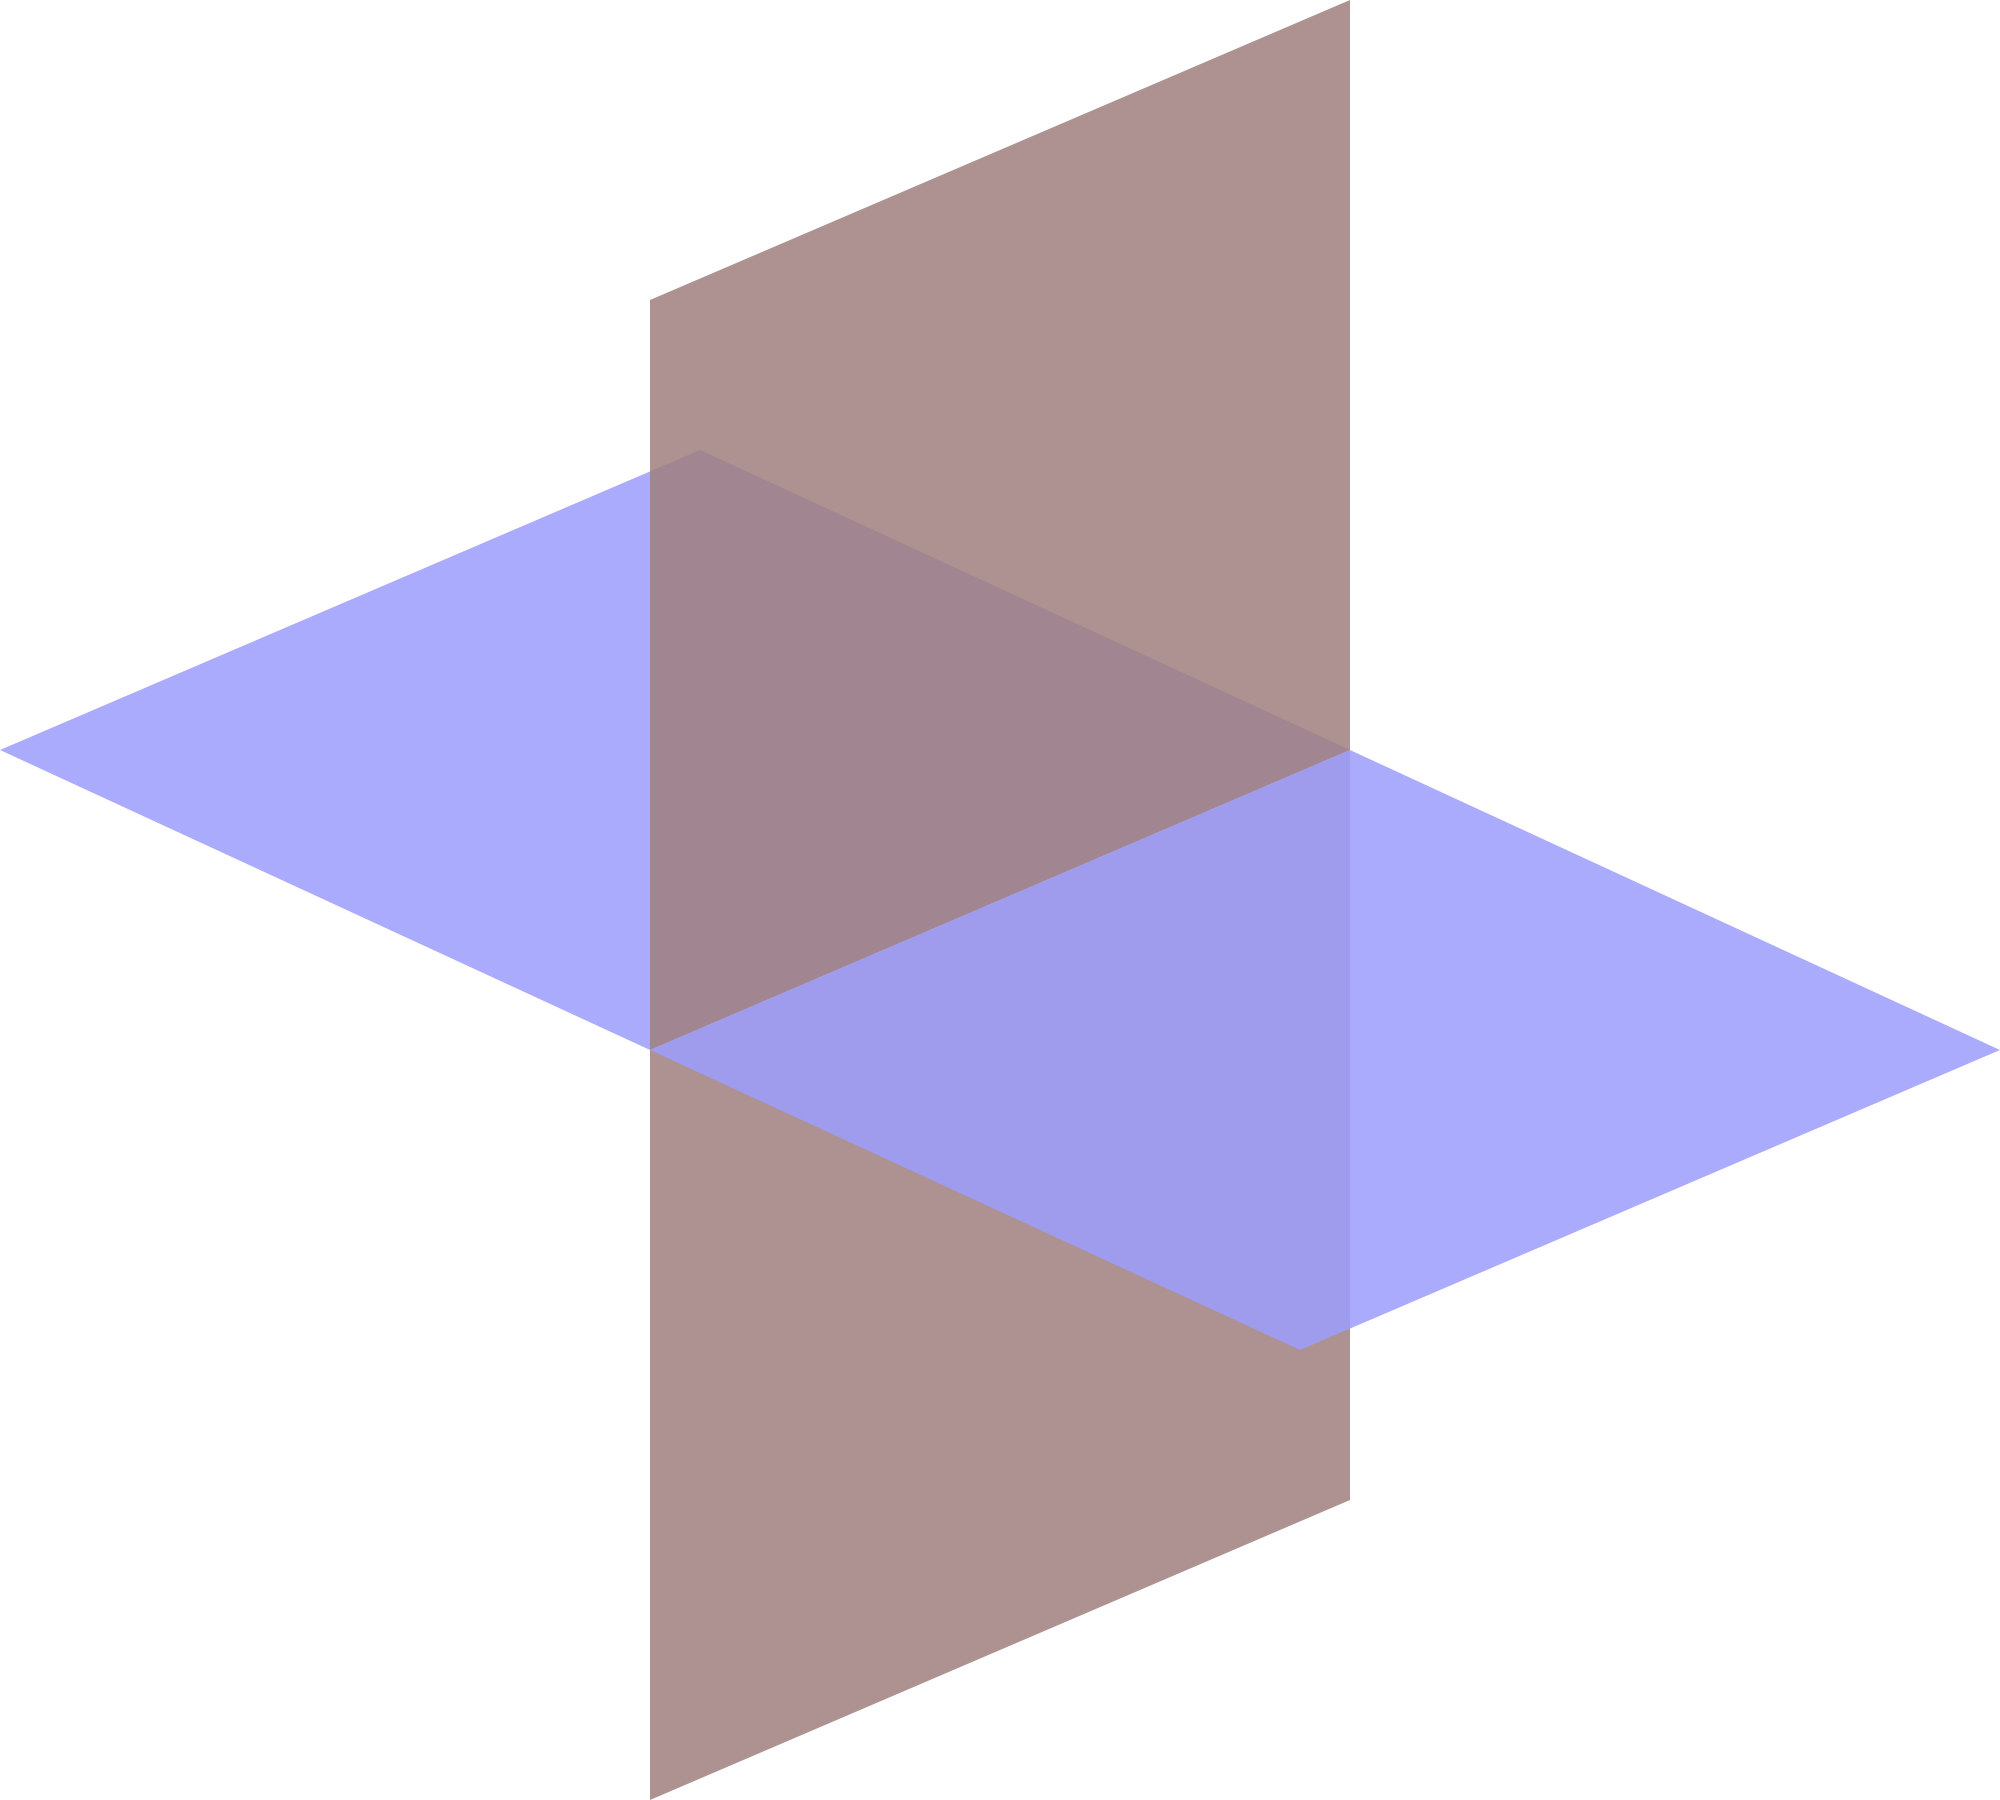 Geometry clipart plane figure. On emaze